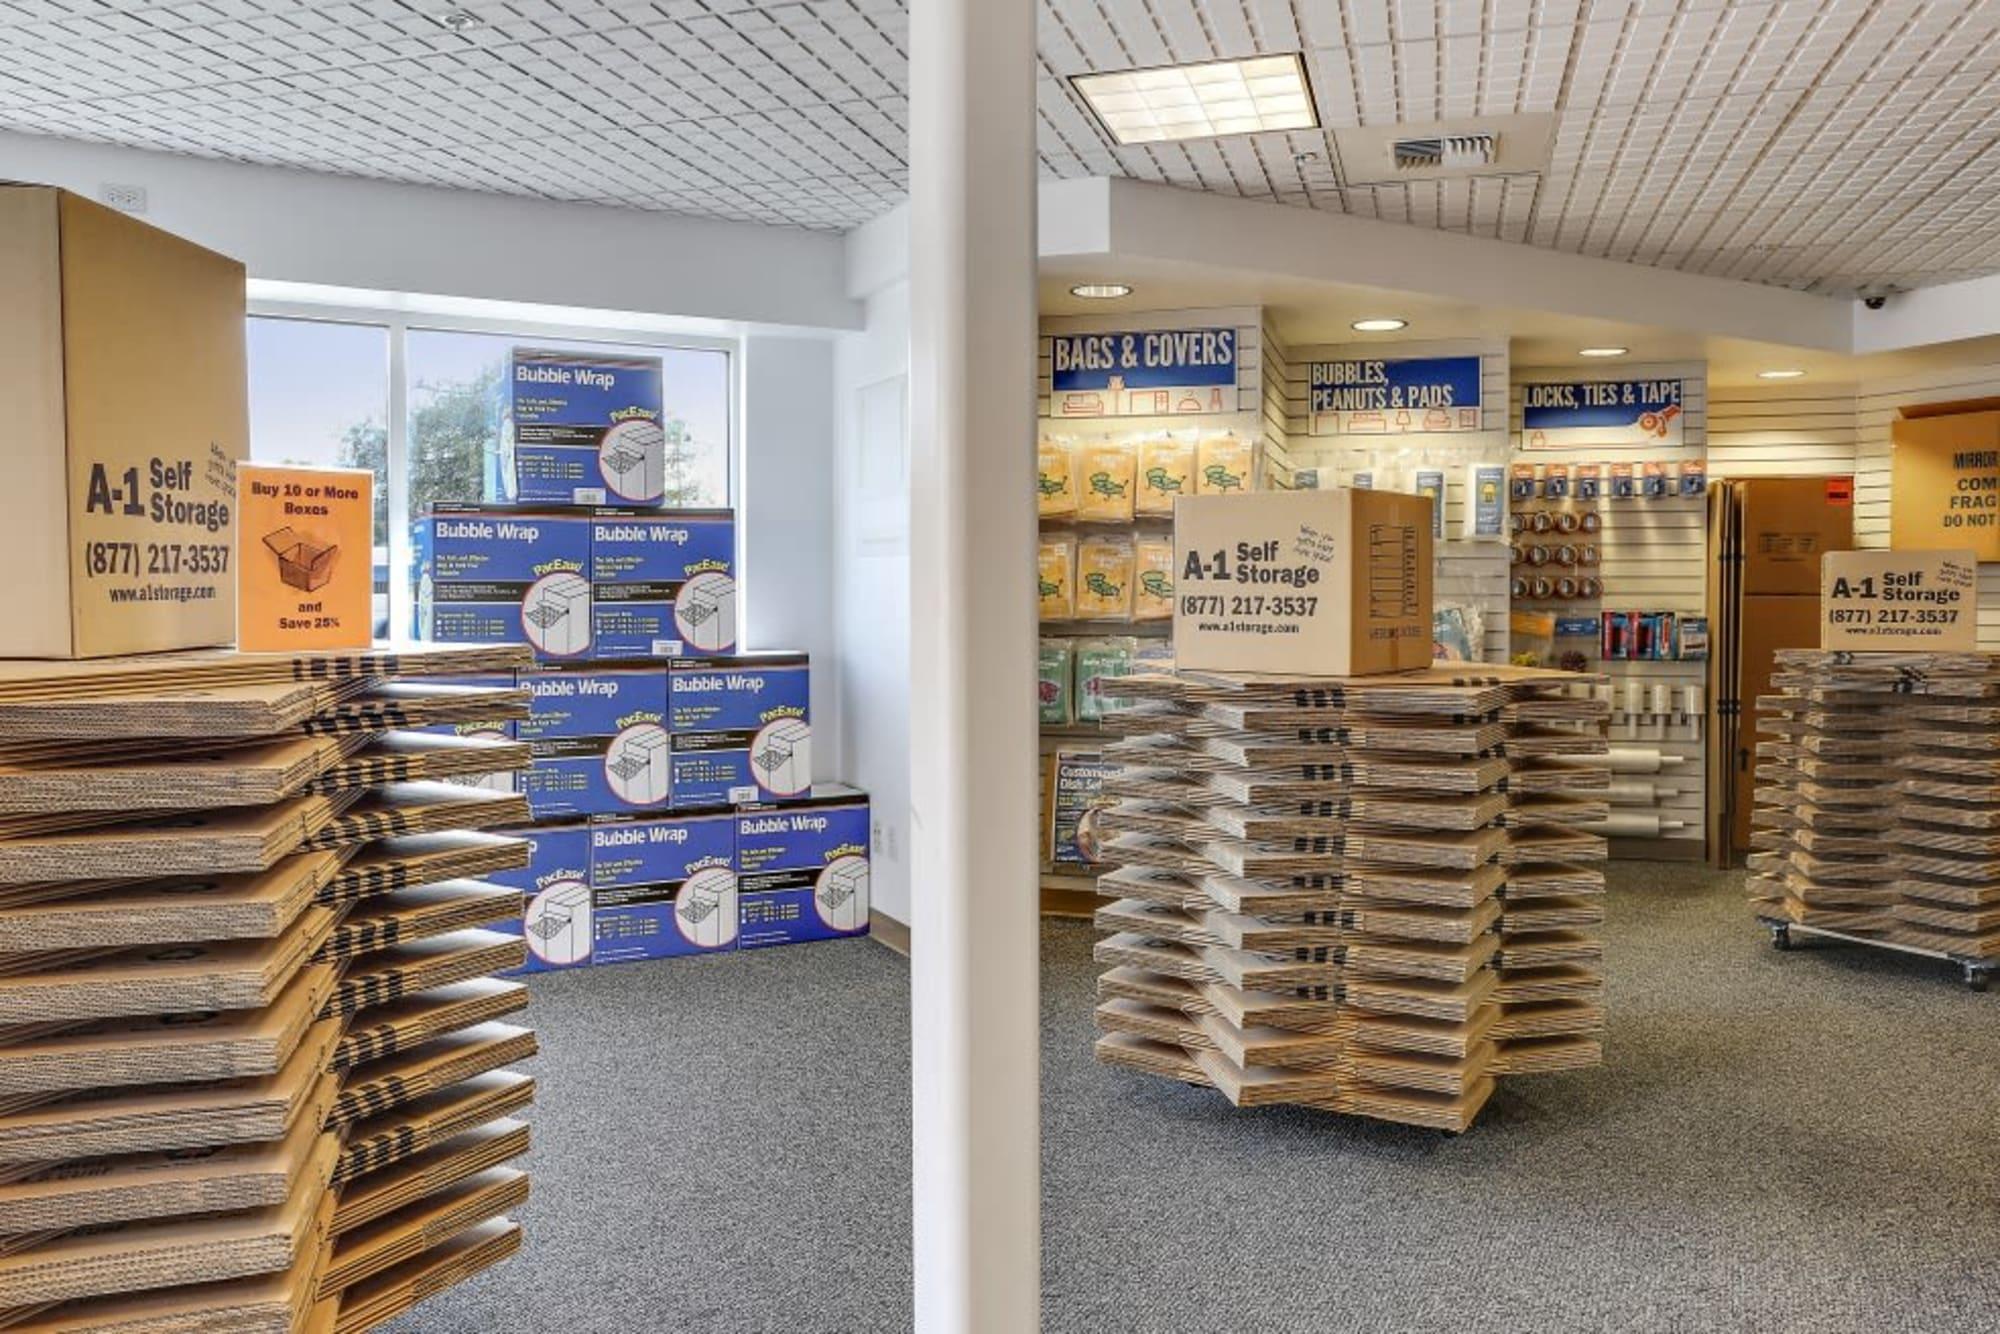 Stacks of boxes at A-1 Self Storage in San Jose, California